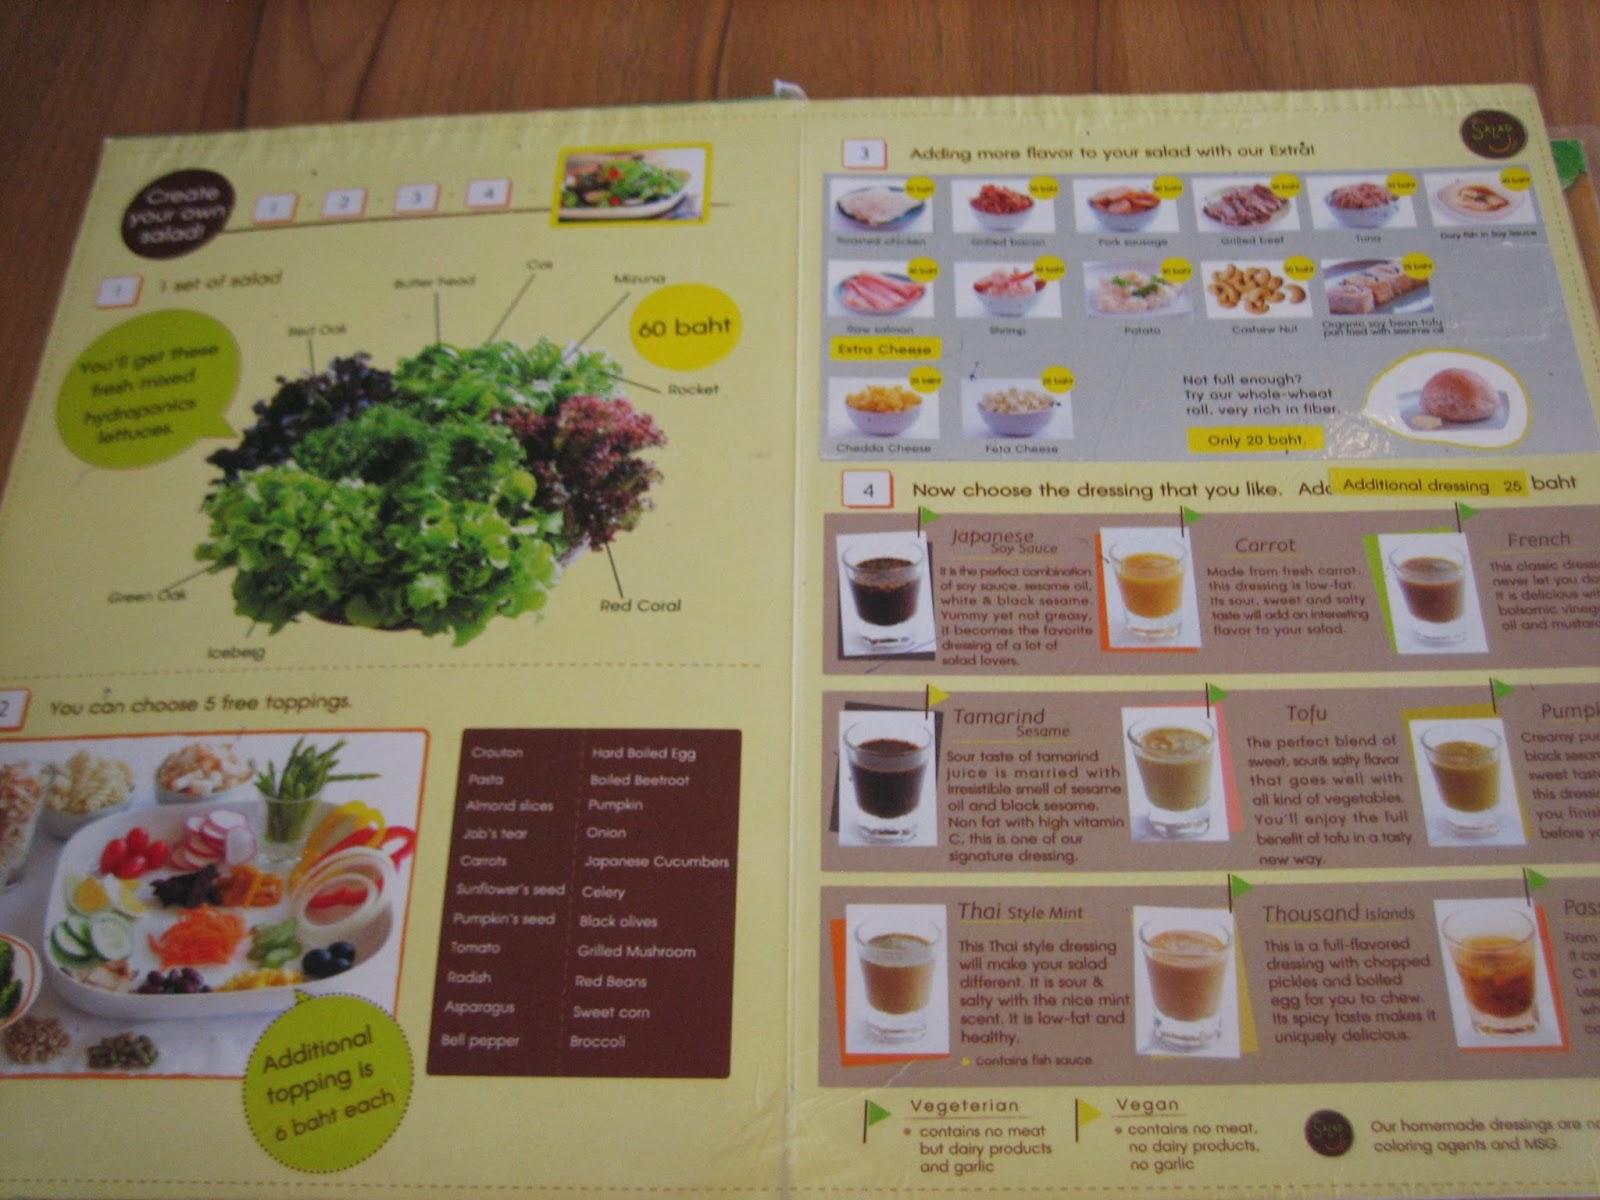 salad-concept-chiang-mai-menu